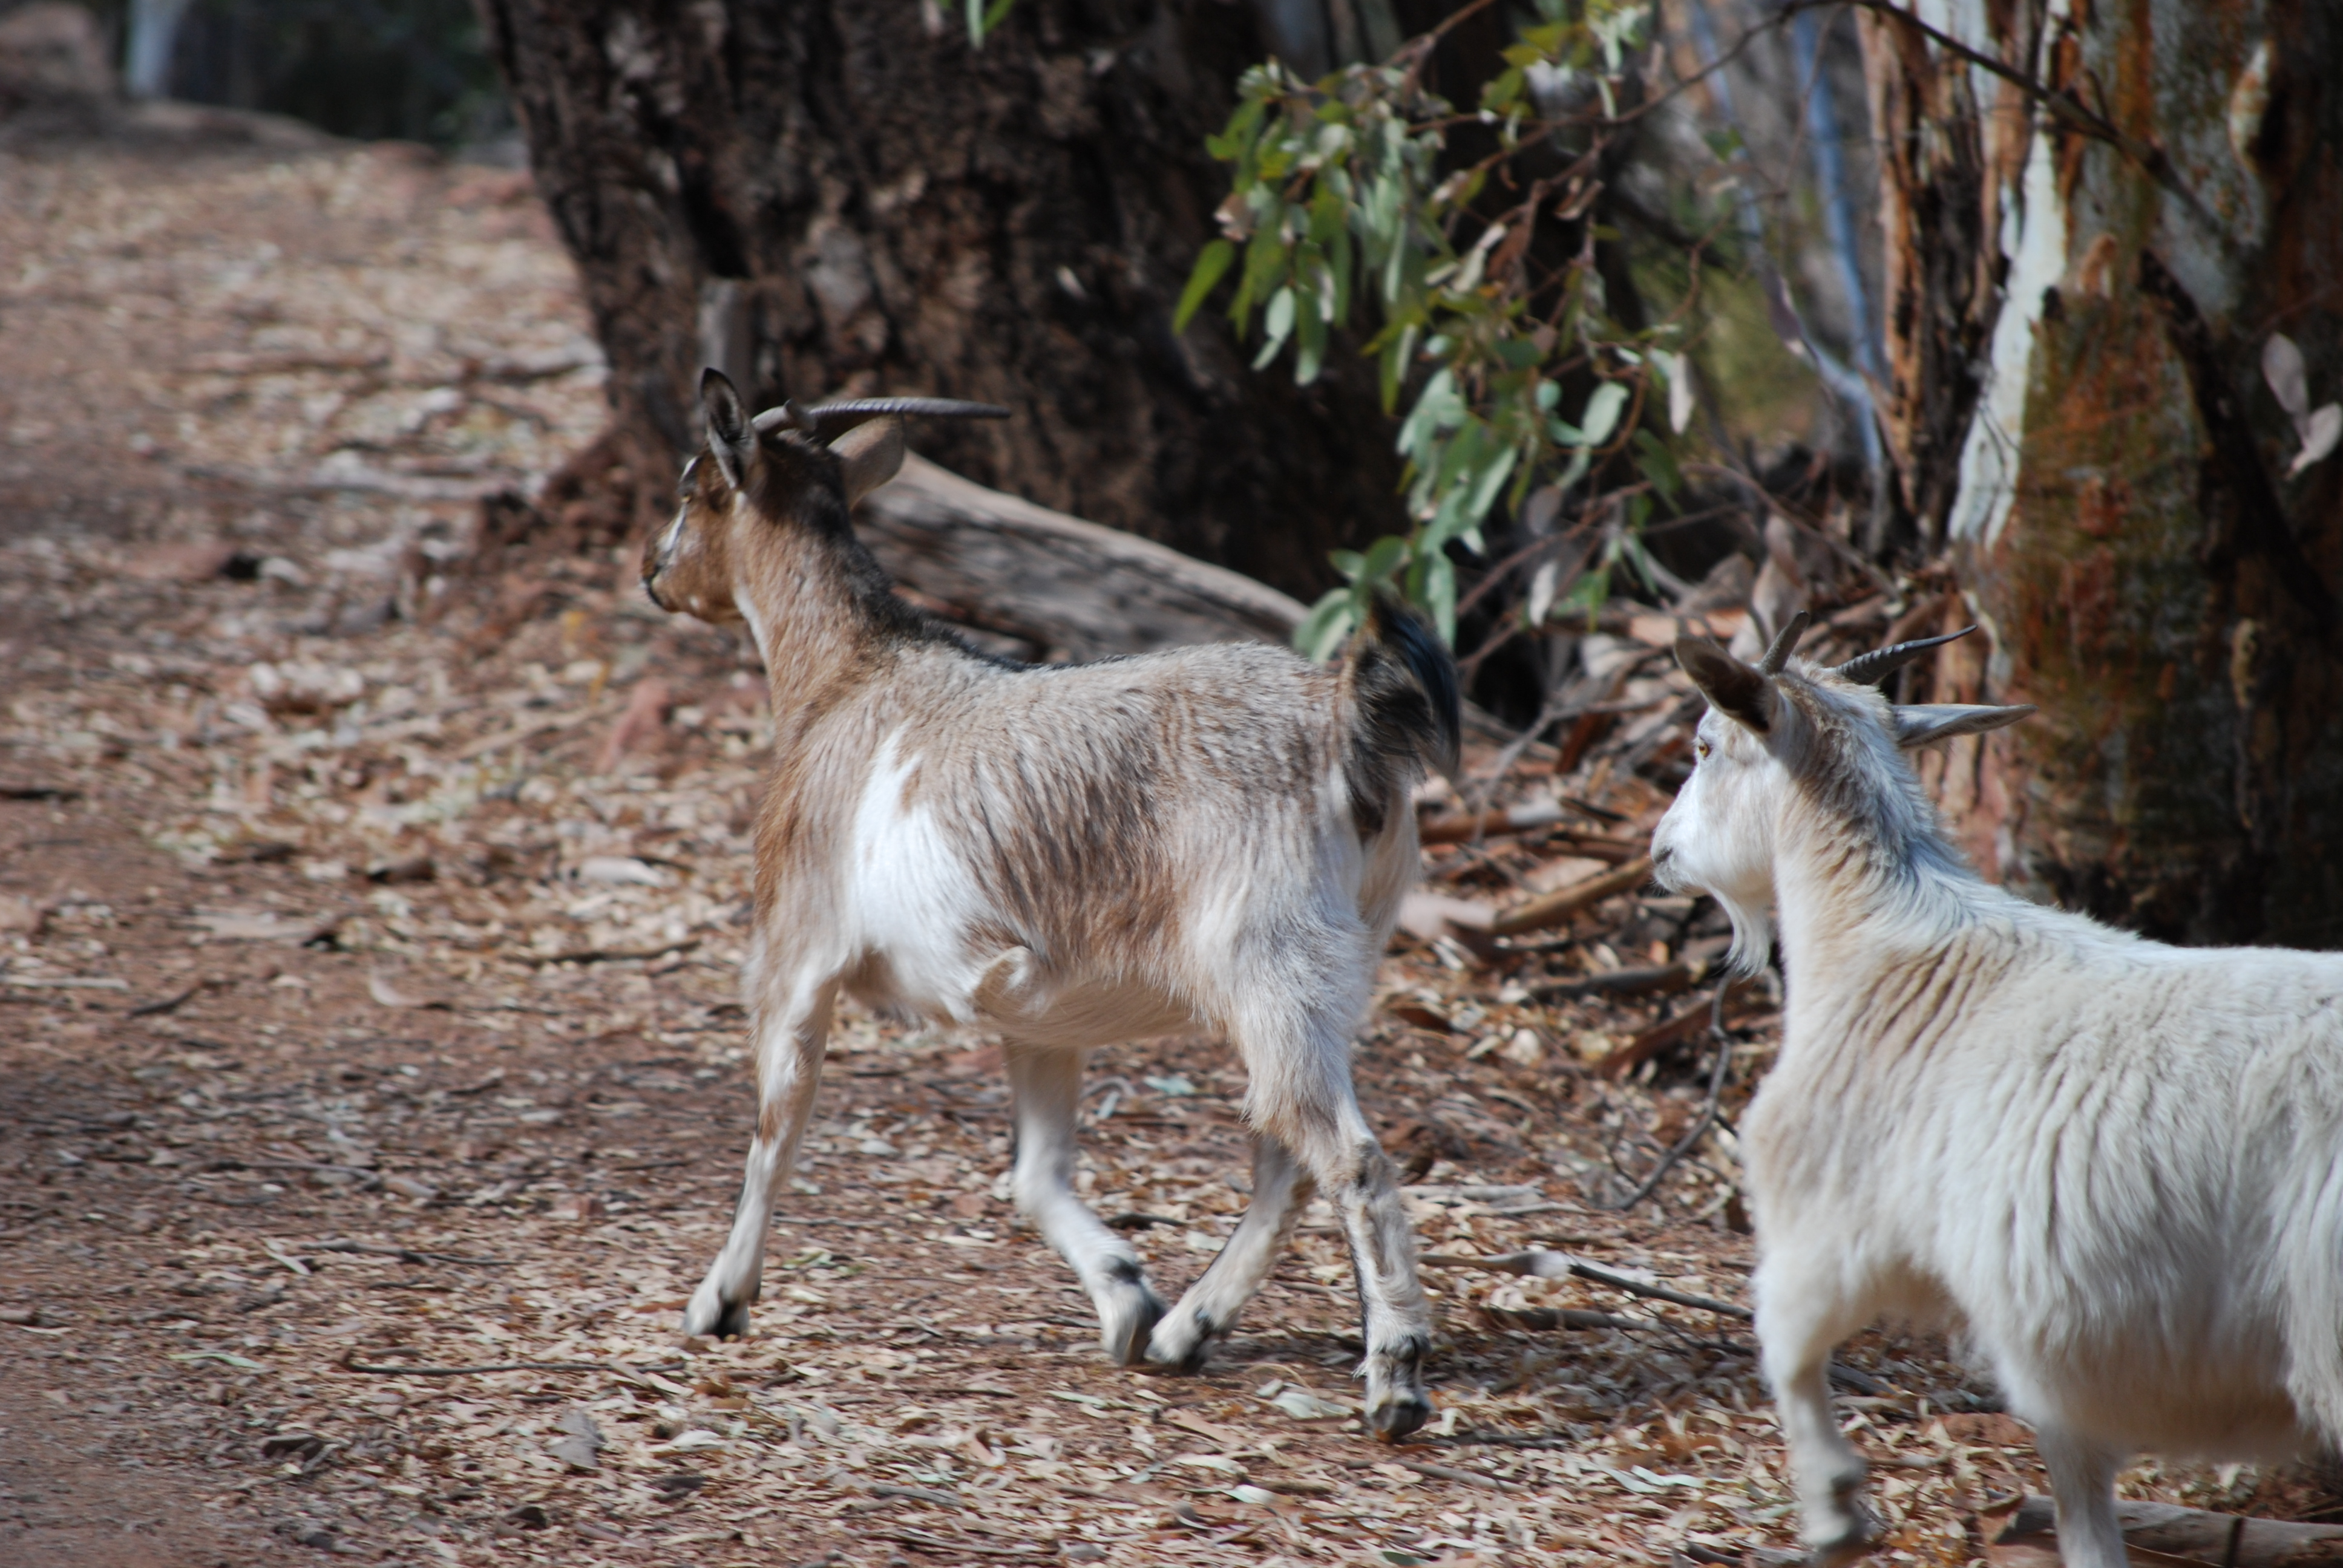 Feral goat - Wikipedia